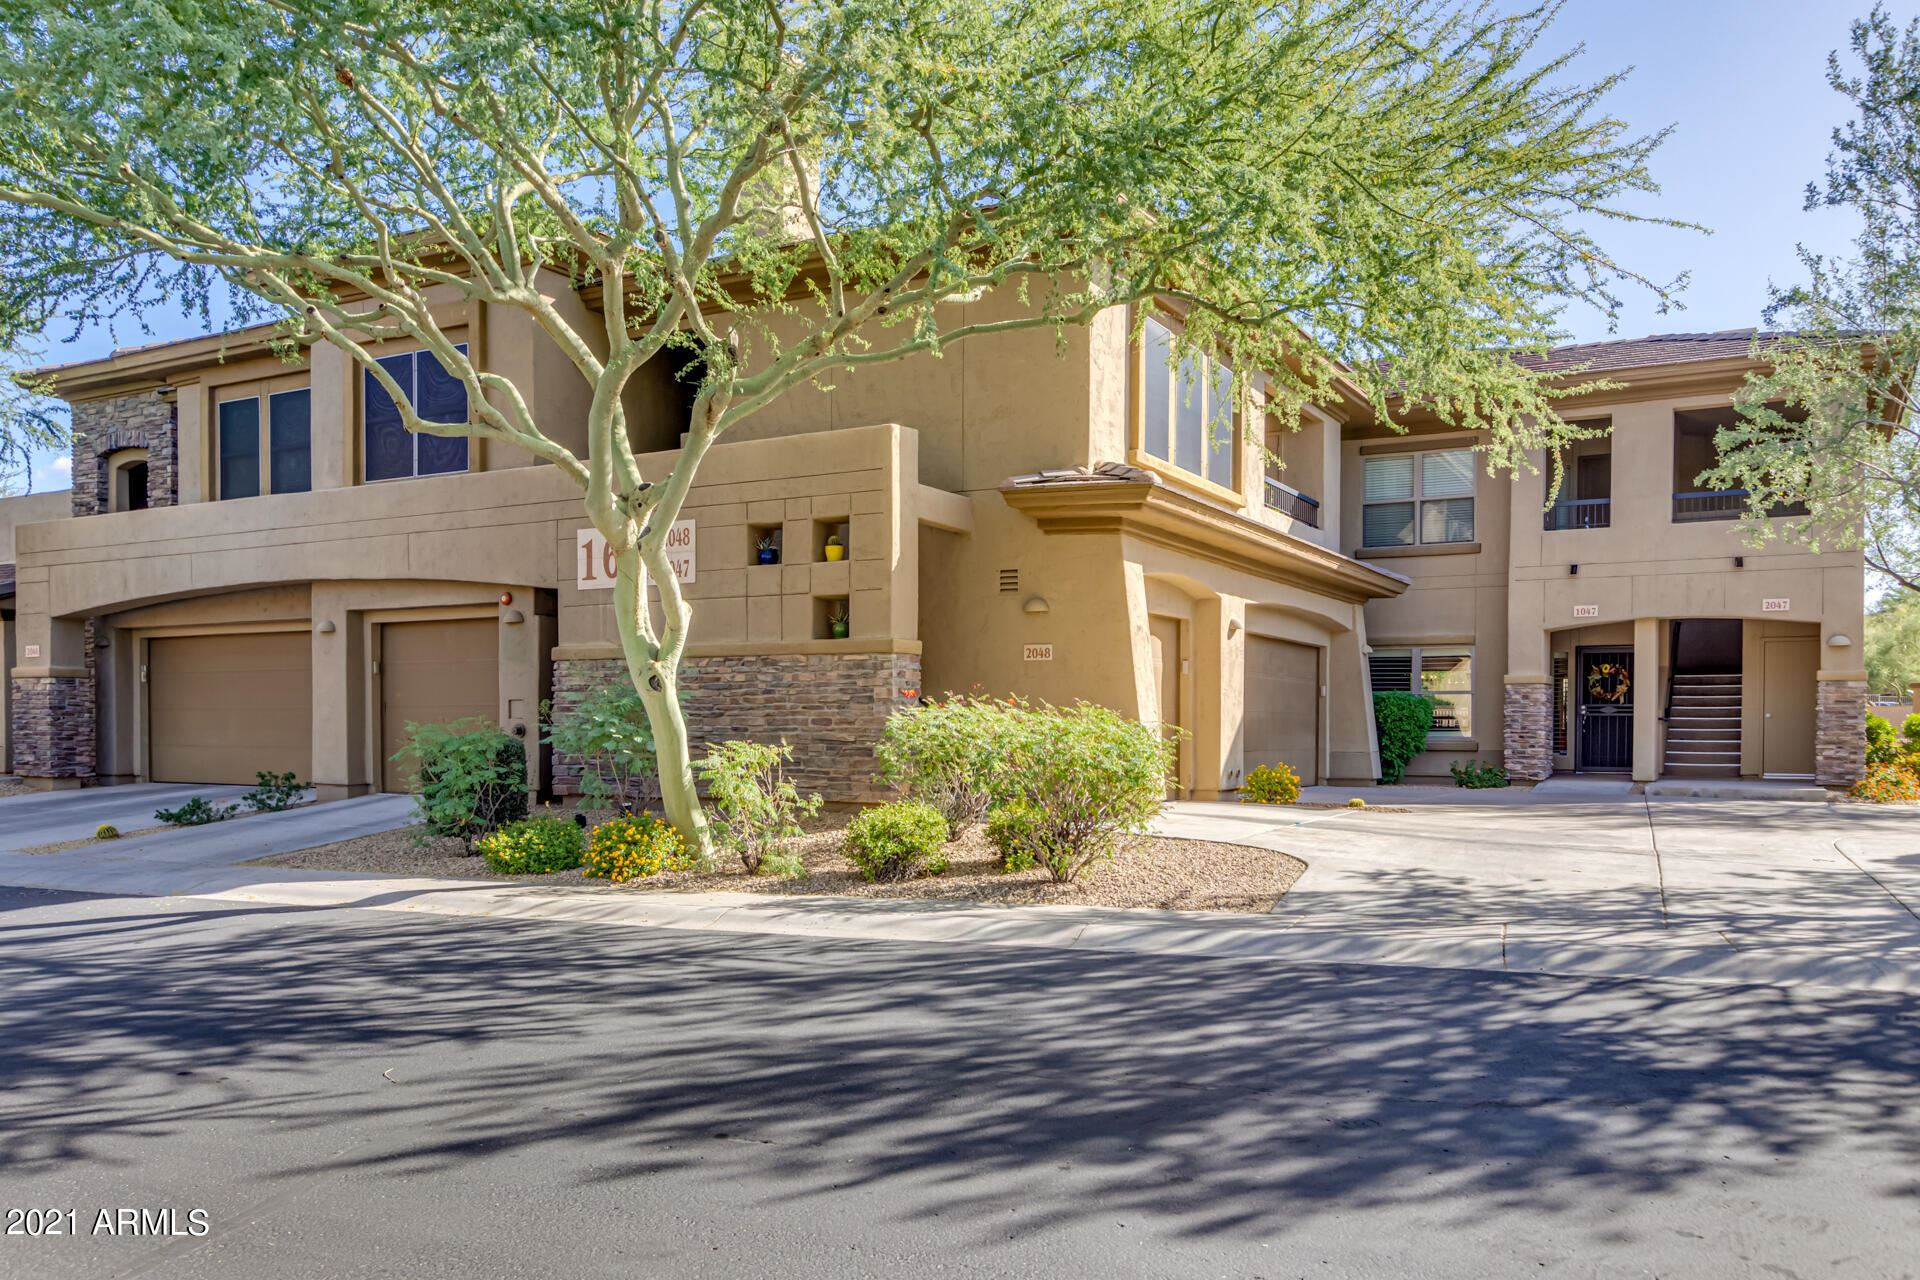 Photo of 33550 N Dove Lakes Drive #1047, Cave Creek, AZ 85331 (MLS # 6311011)